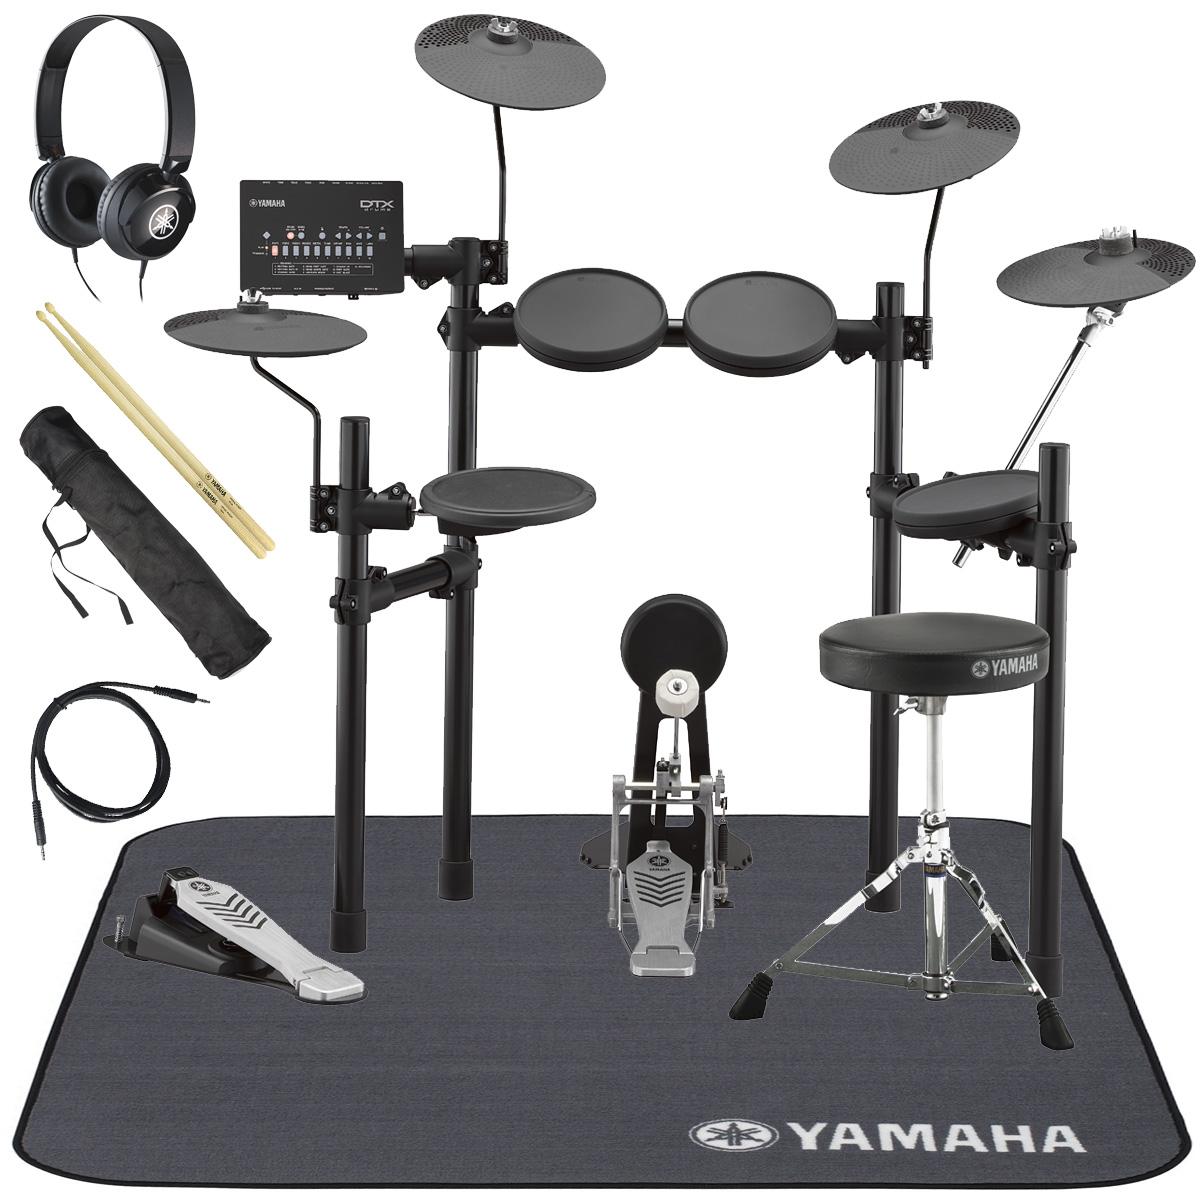 YAMAHA / DTX452KUPGS 電子ドラム ヤマハ純正ヘッドホンとスティックとマットセット【YRK】